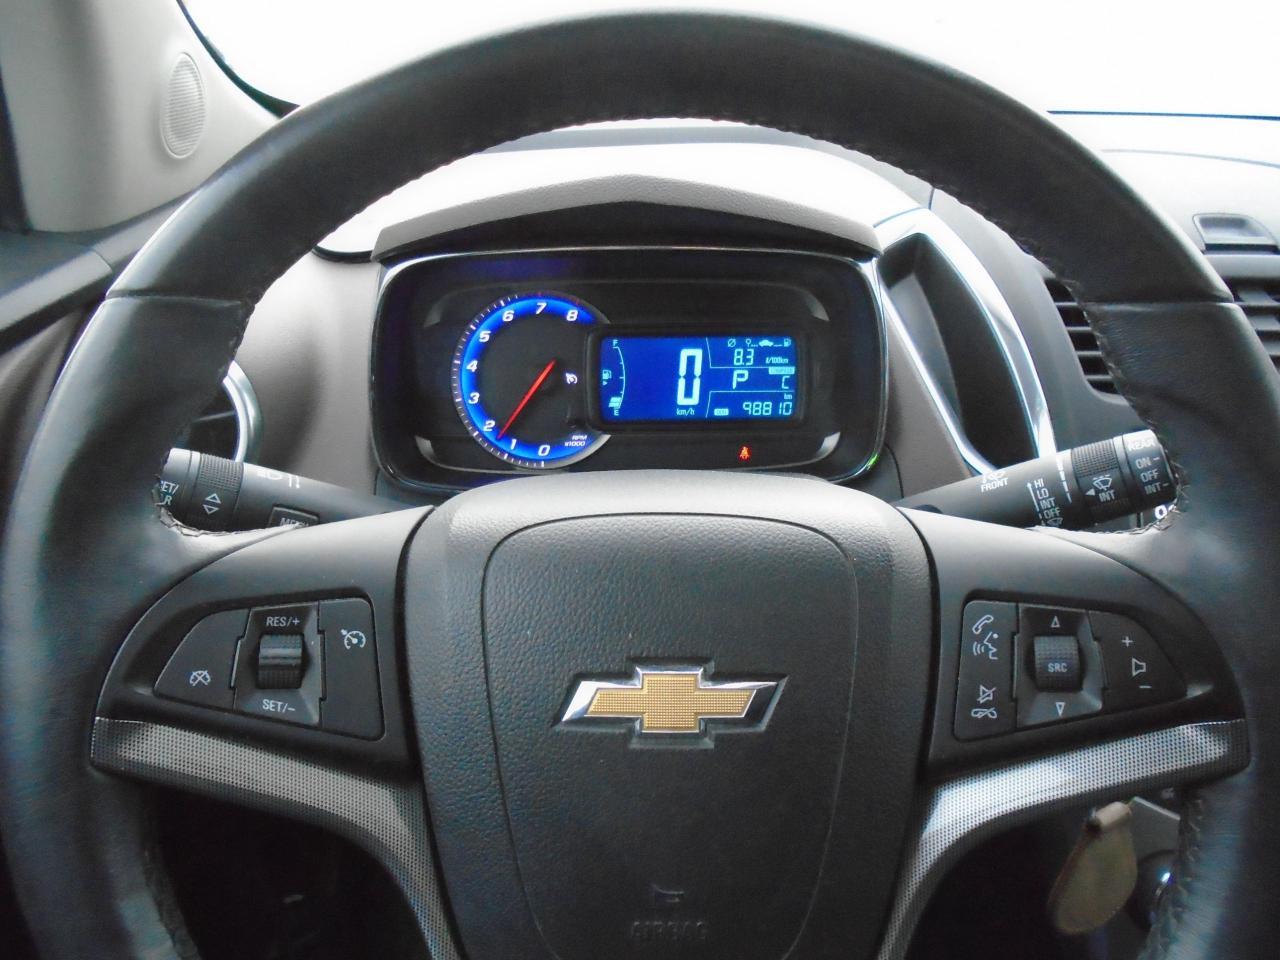 2013 Chevrolet Trax LTZ